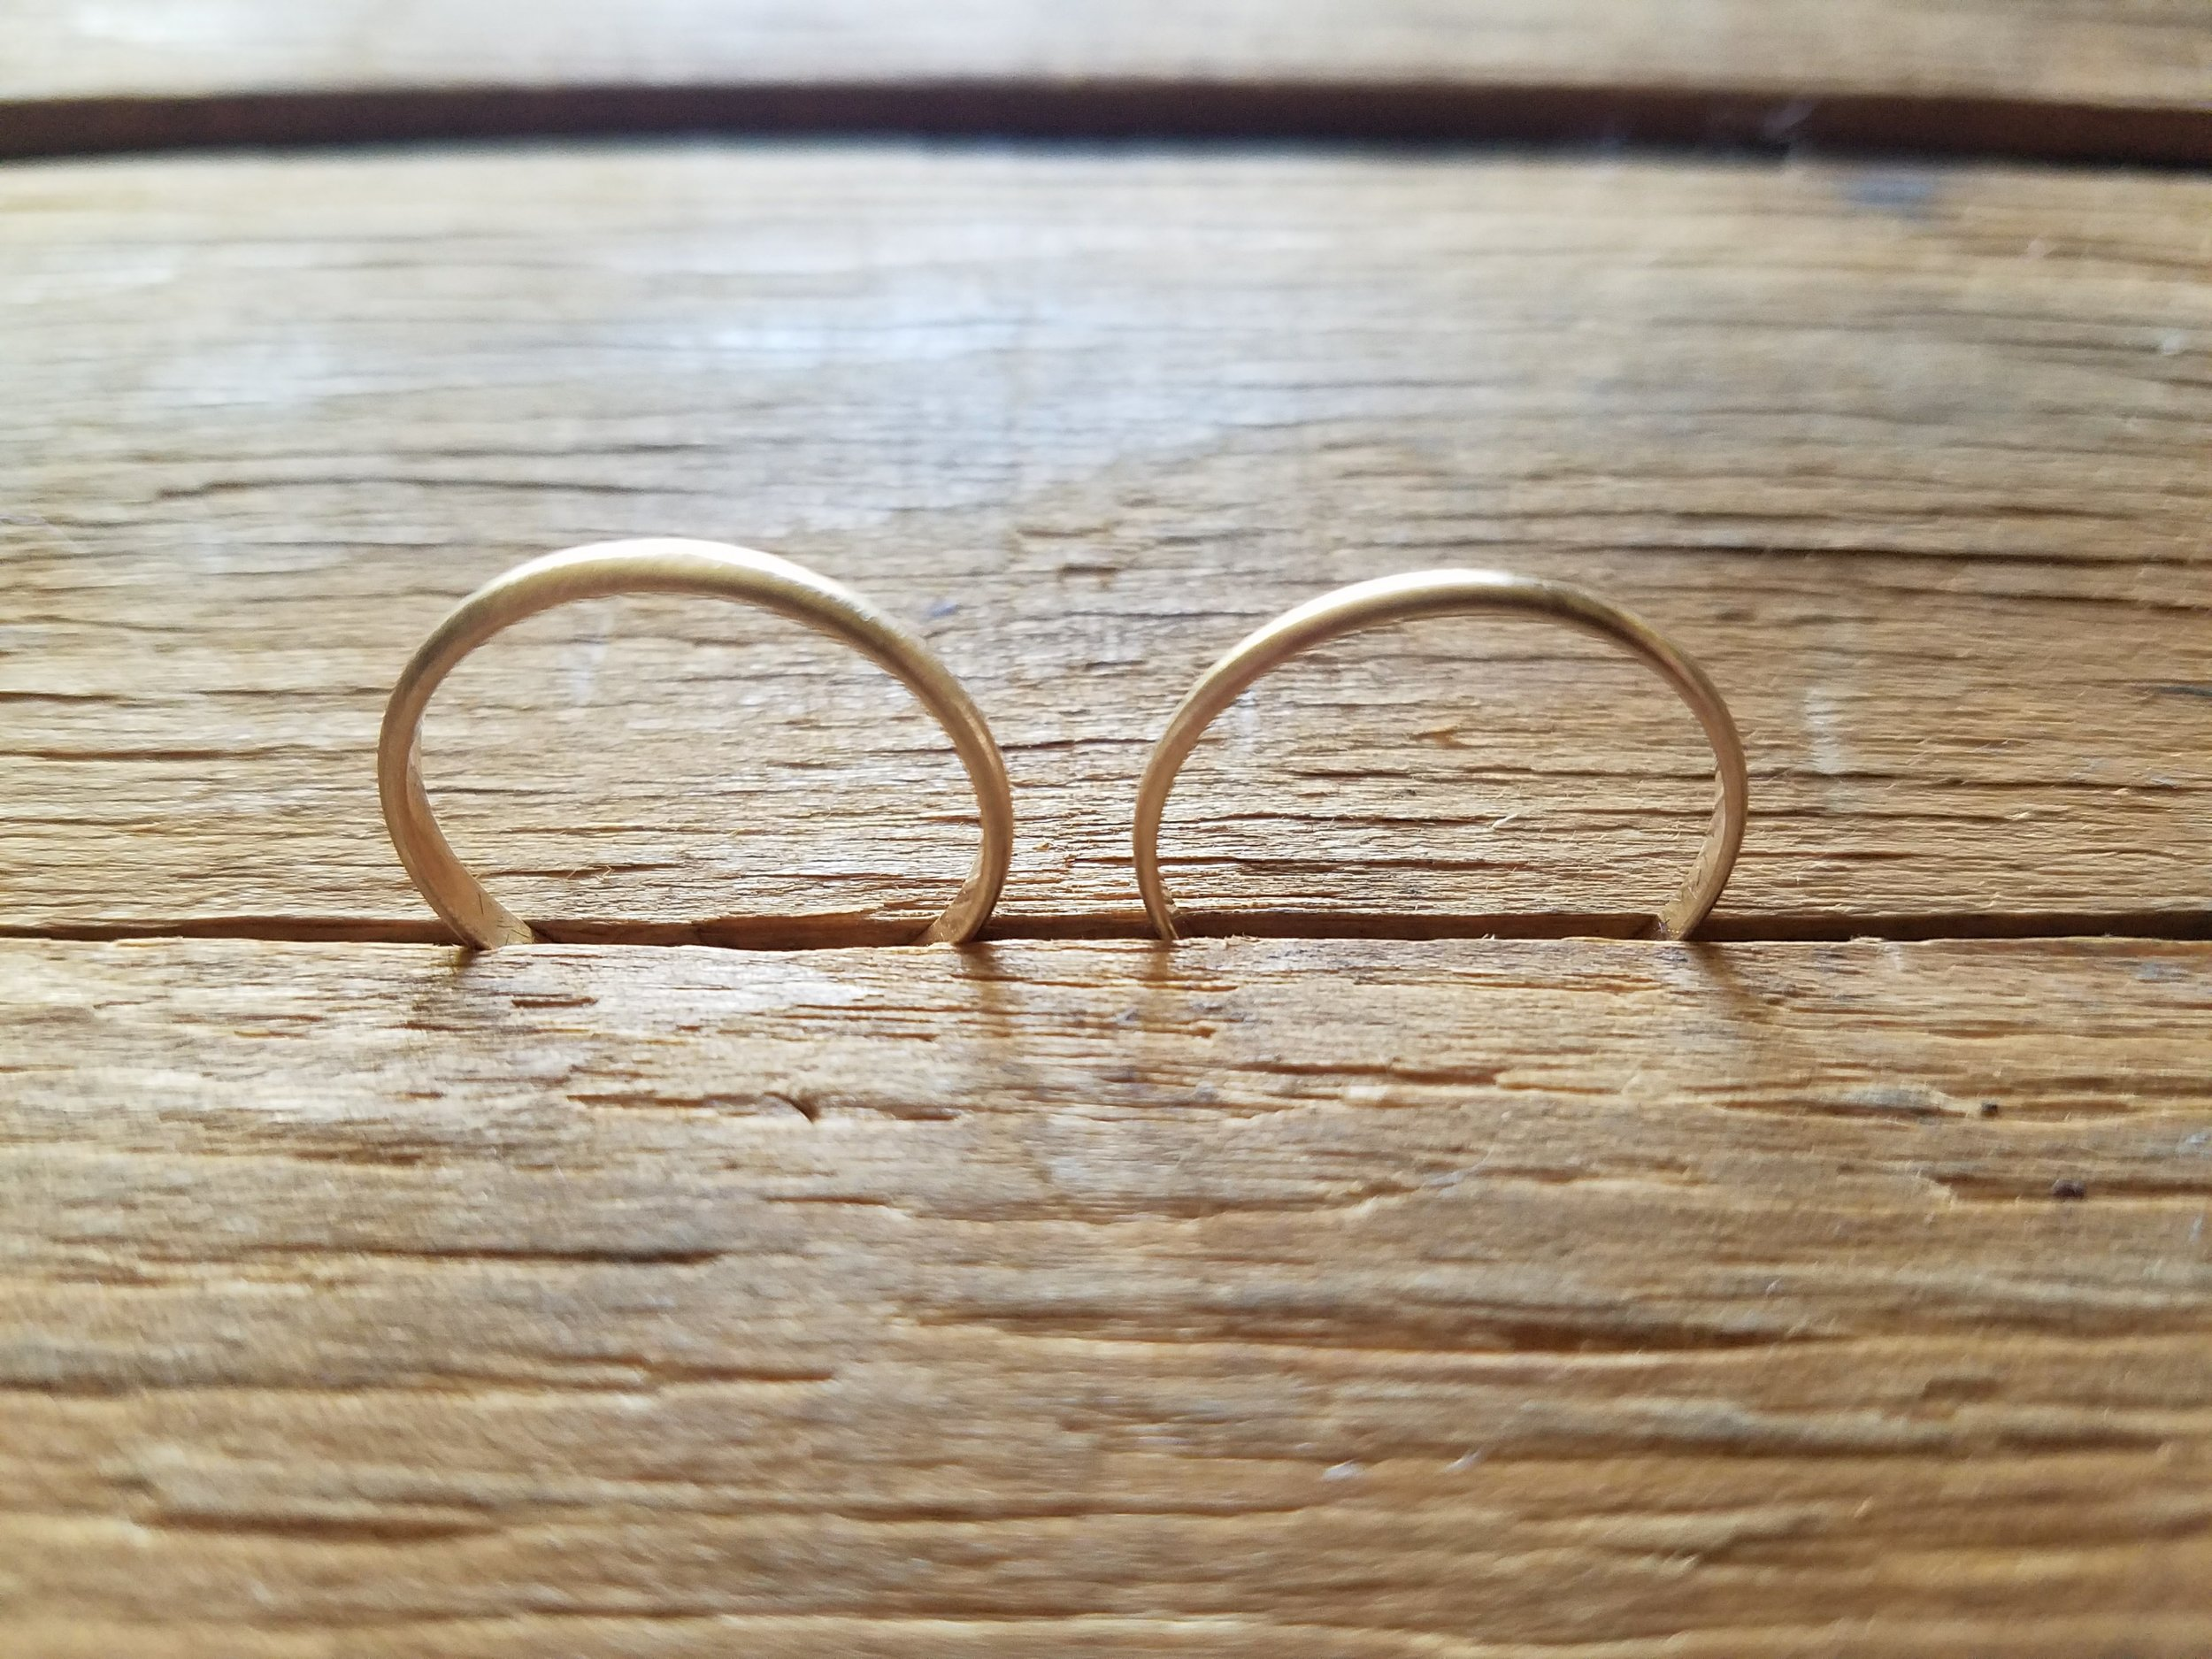 14k Gold Wedding Rings top view